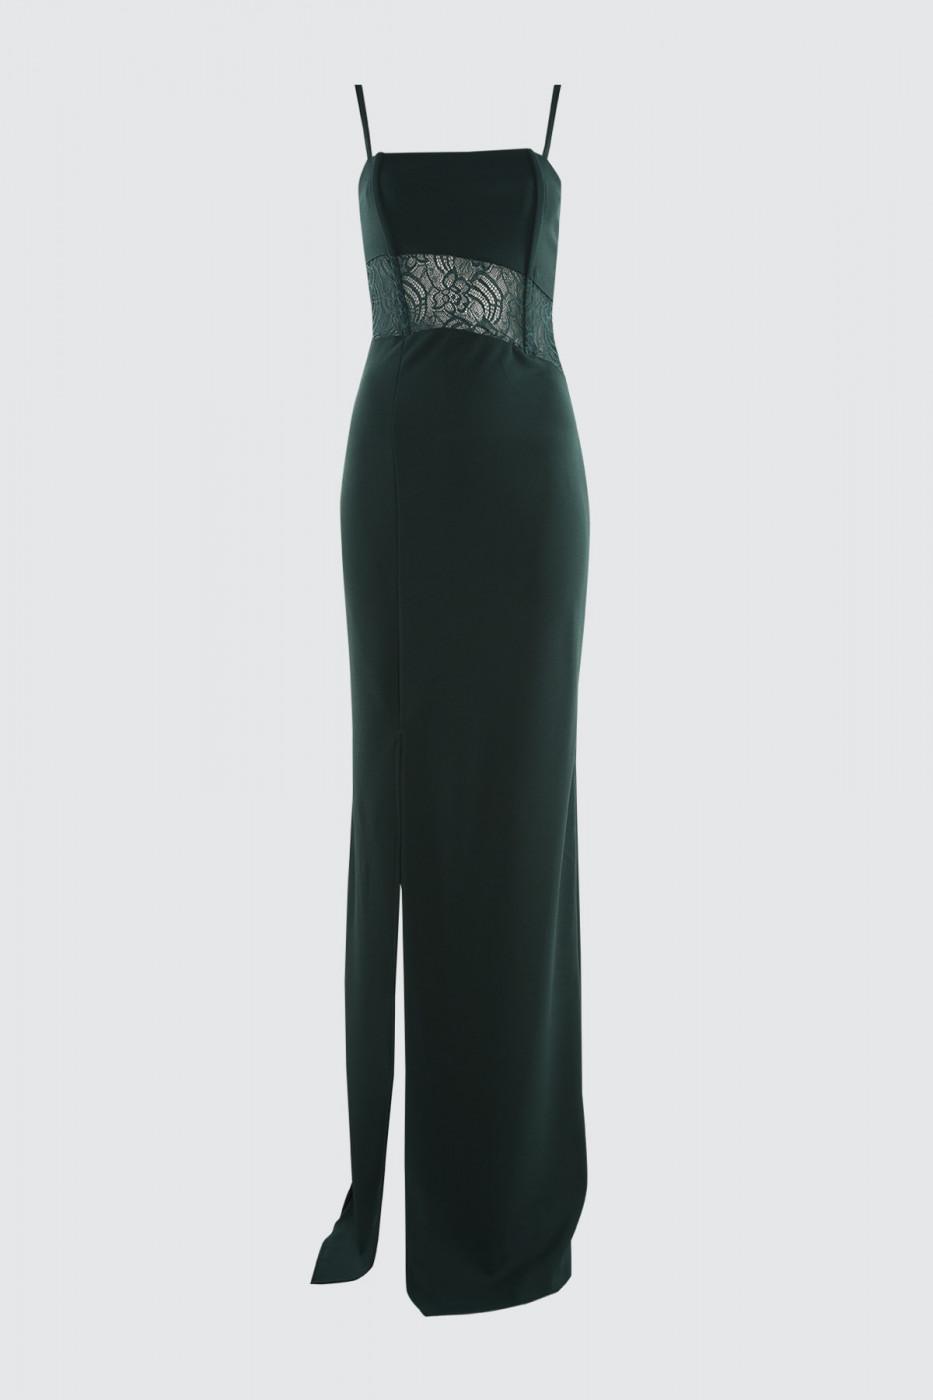 Trendyol Emerald Green Lace Detailed Balenli Evening Dress & Graduation Dress